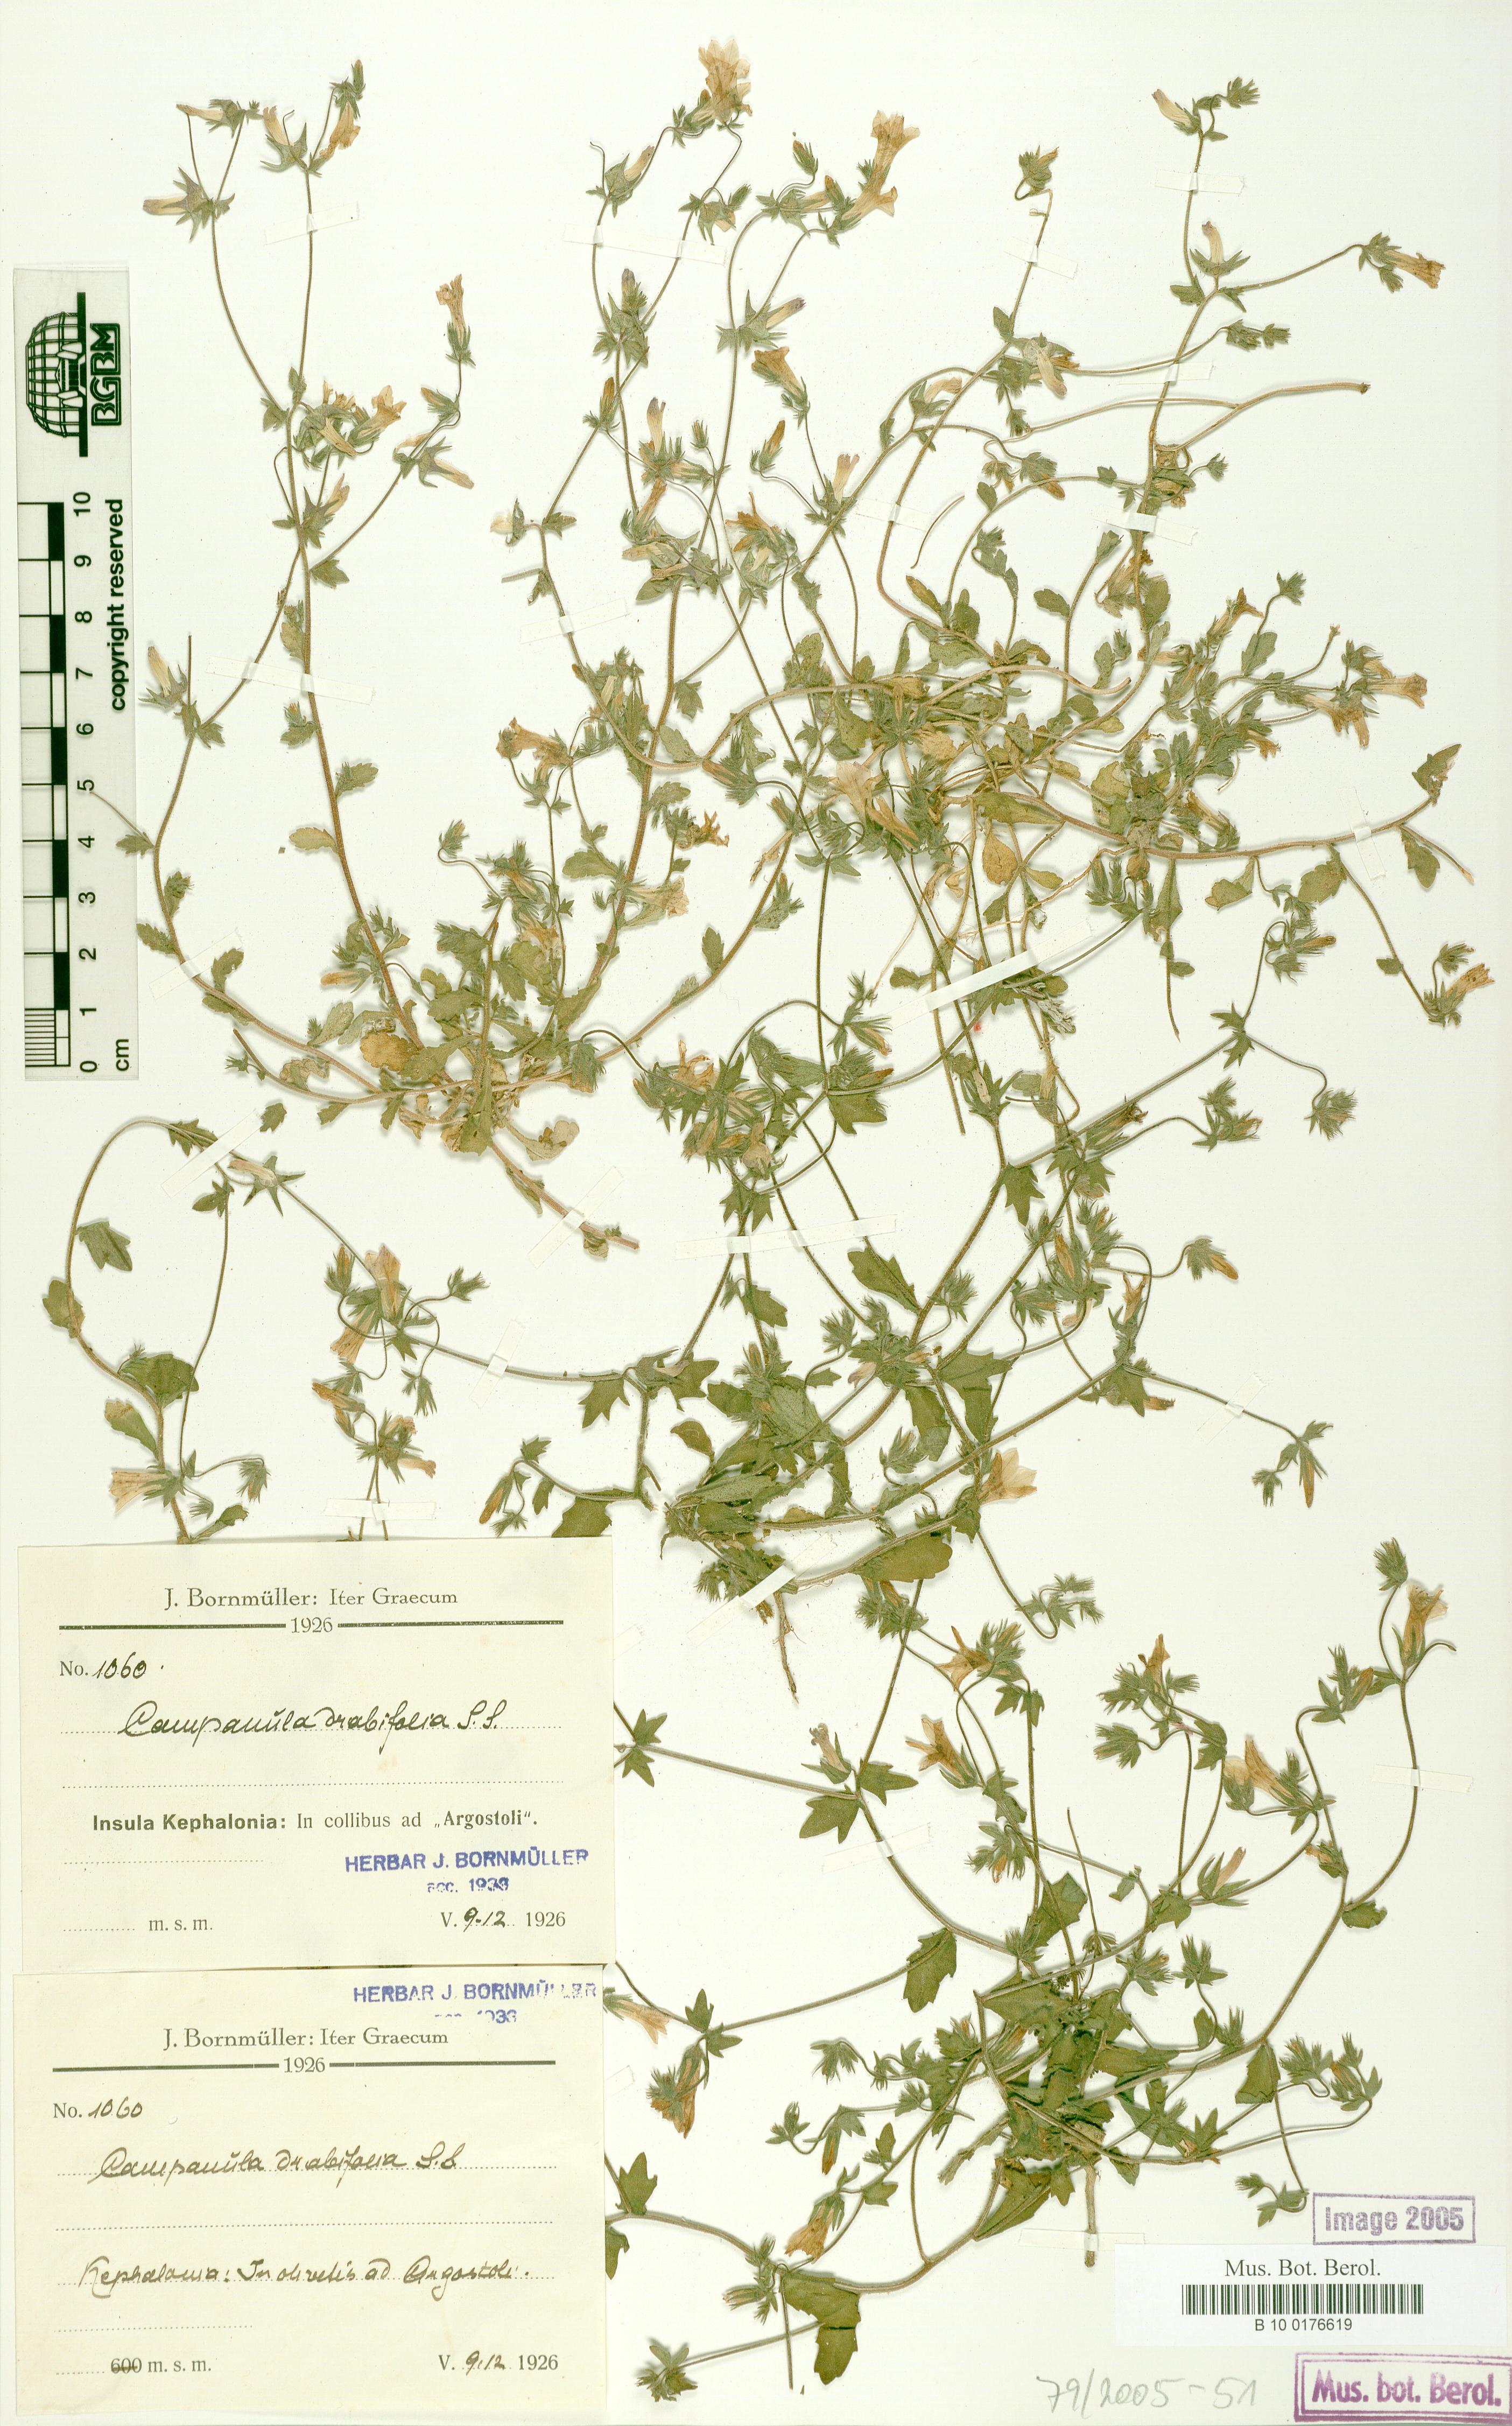 http://ww2.bgbm.org/herbarium/images/B/10/01/76/61/B_10_0176619.jpg